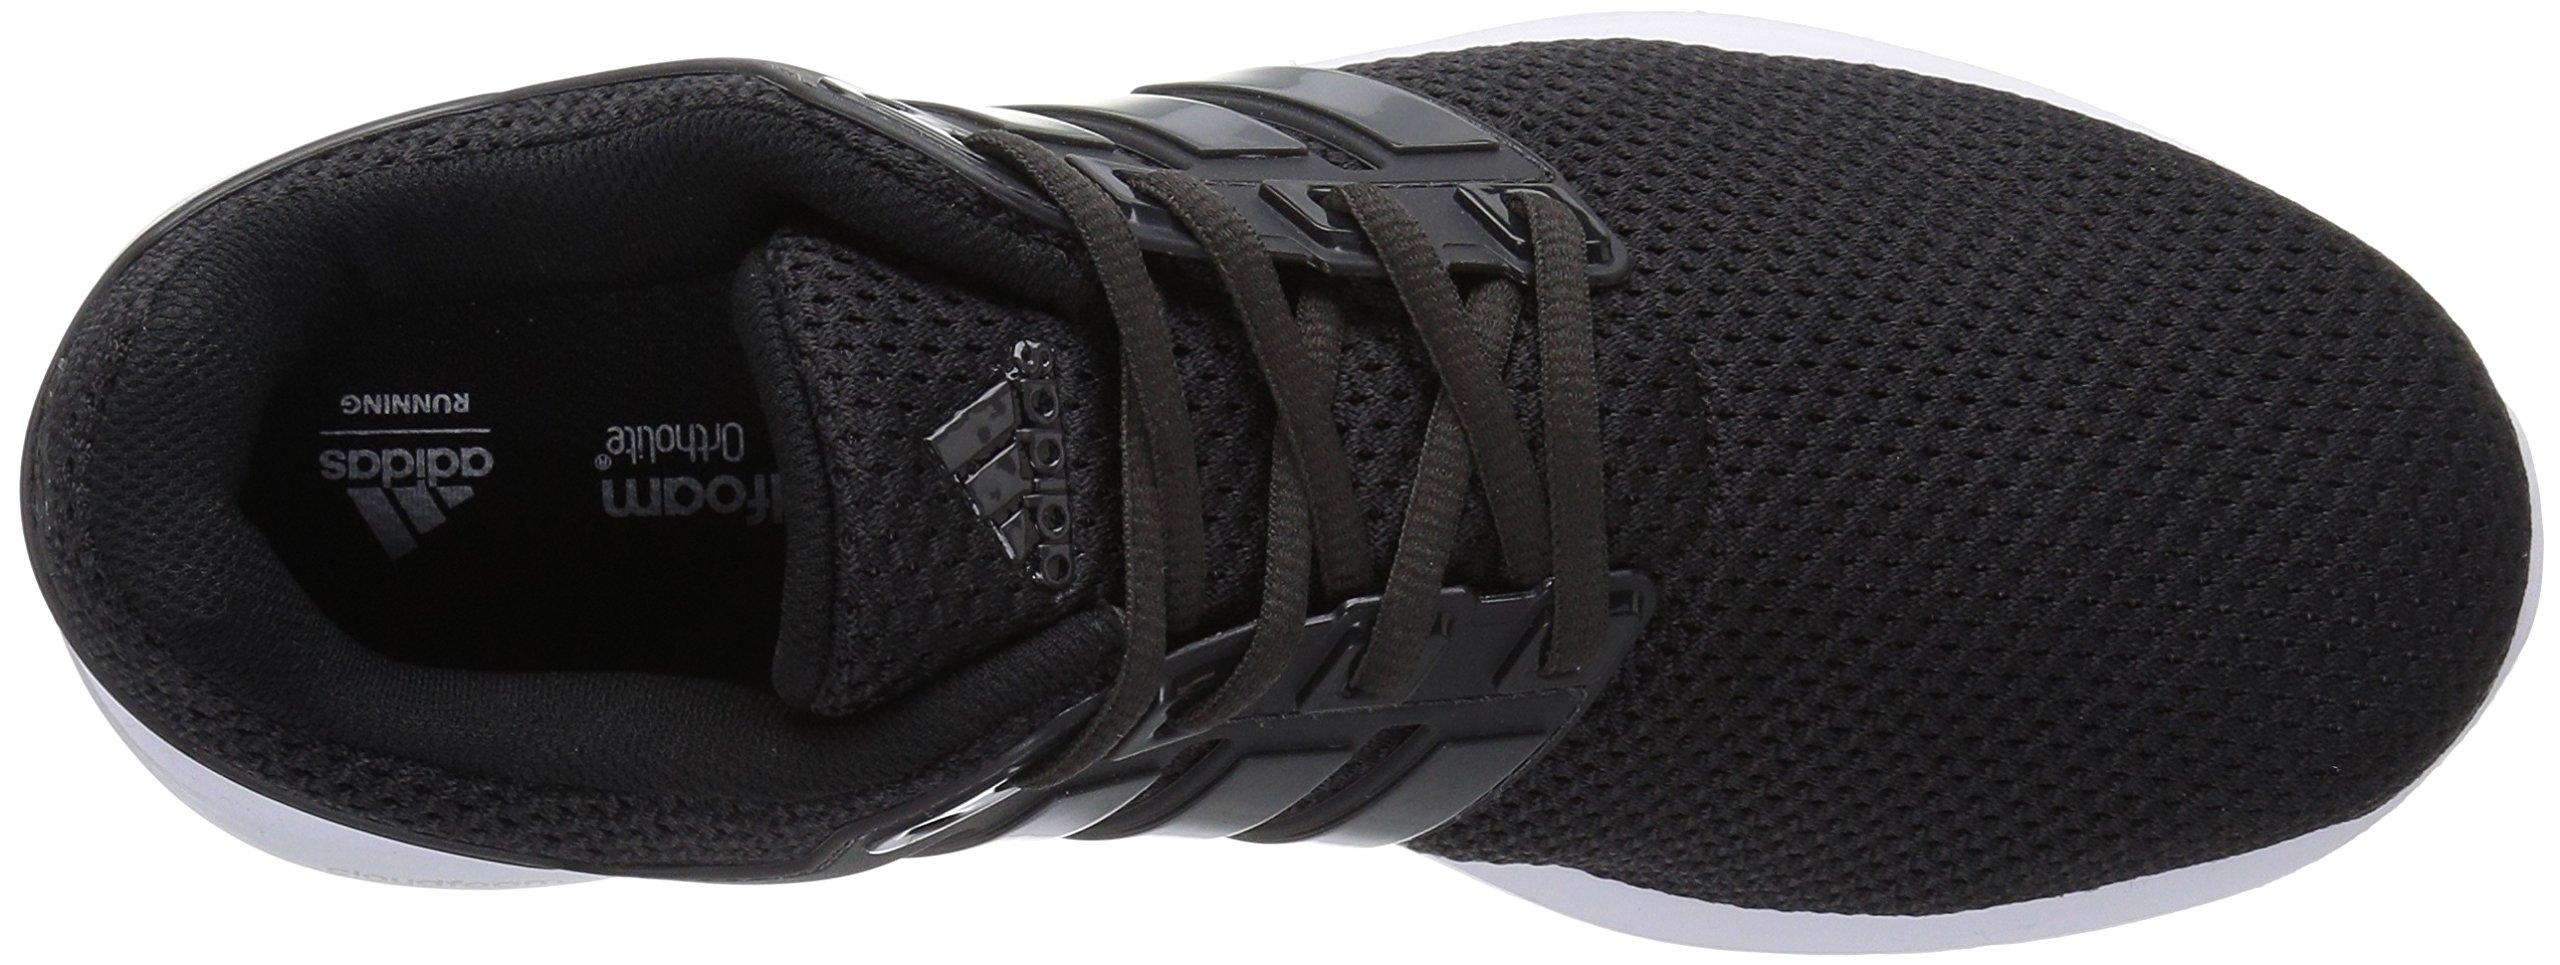 adidas  Men's Energy Cloud Wide m Running Shoe, BLACK/UTILITY BLACK/WHITE, 10.5 2E US by adidas (Image #8)